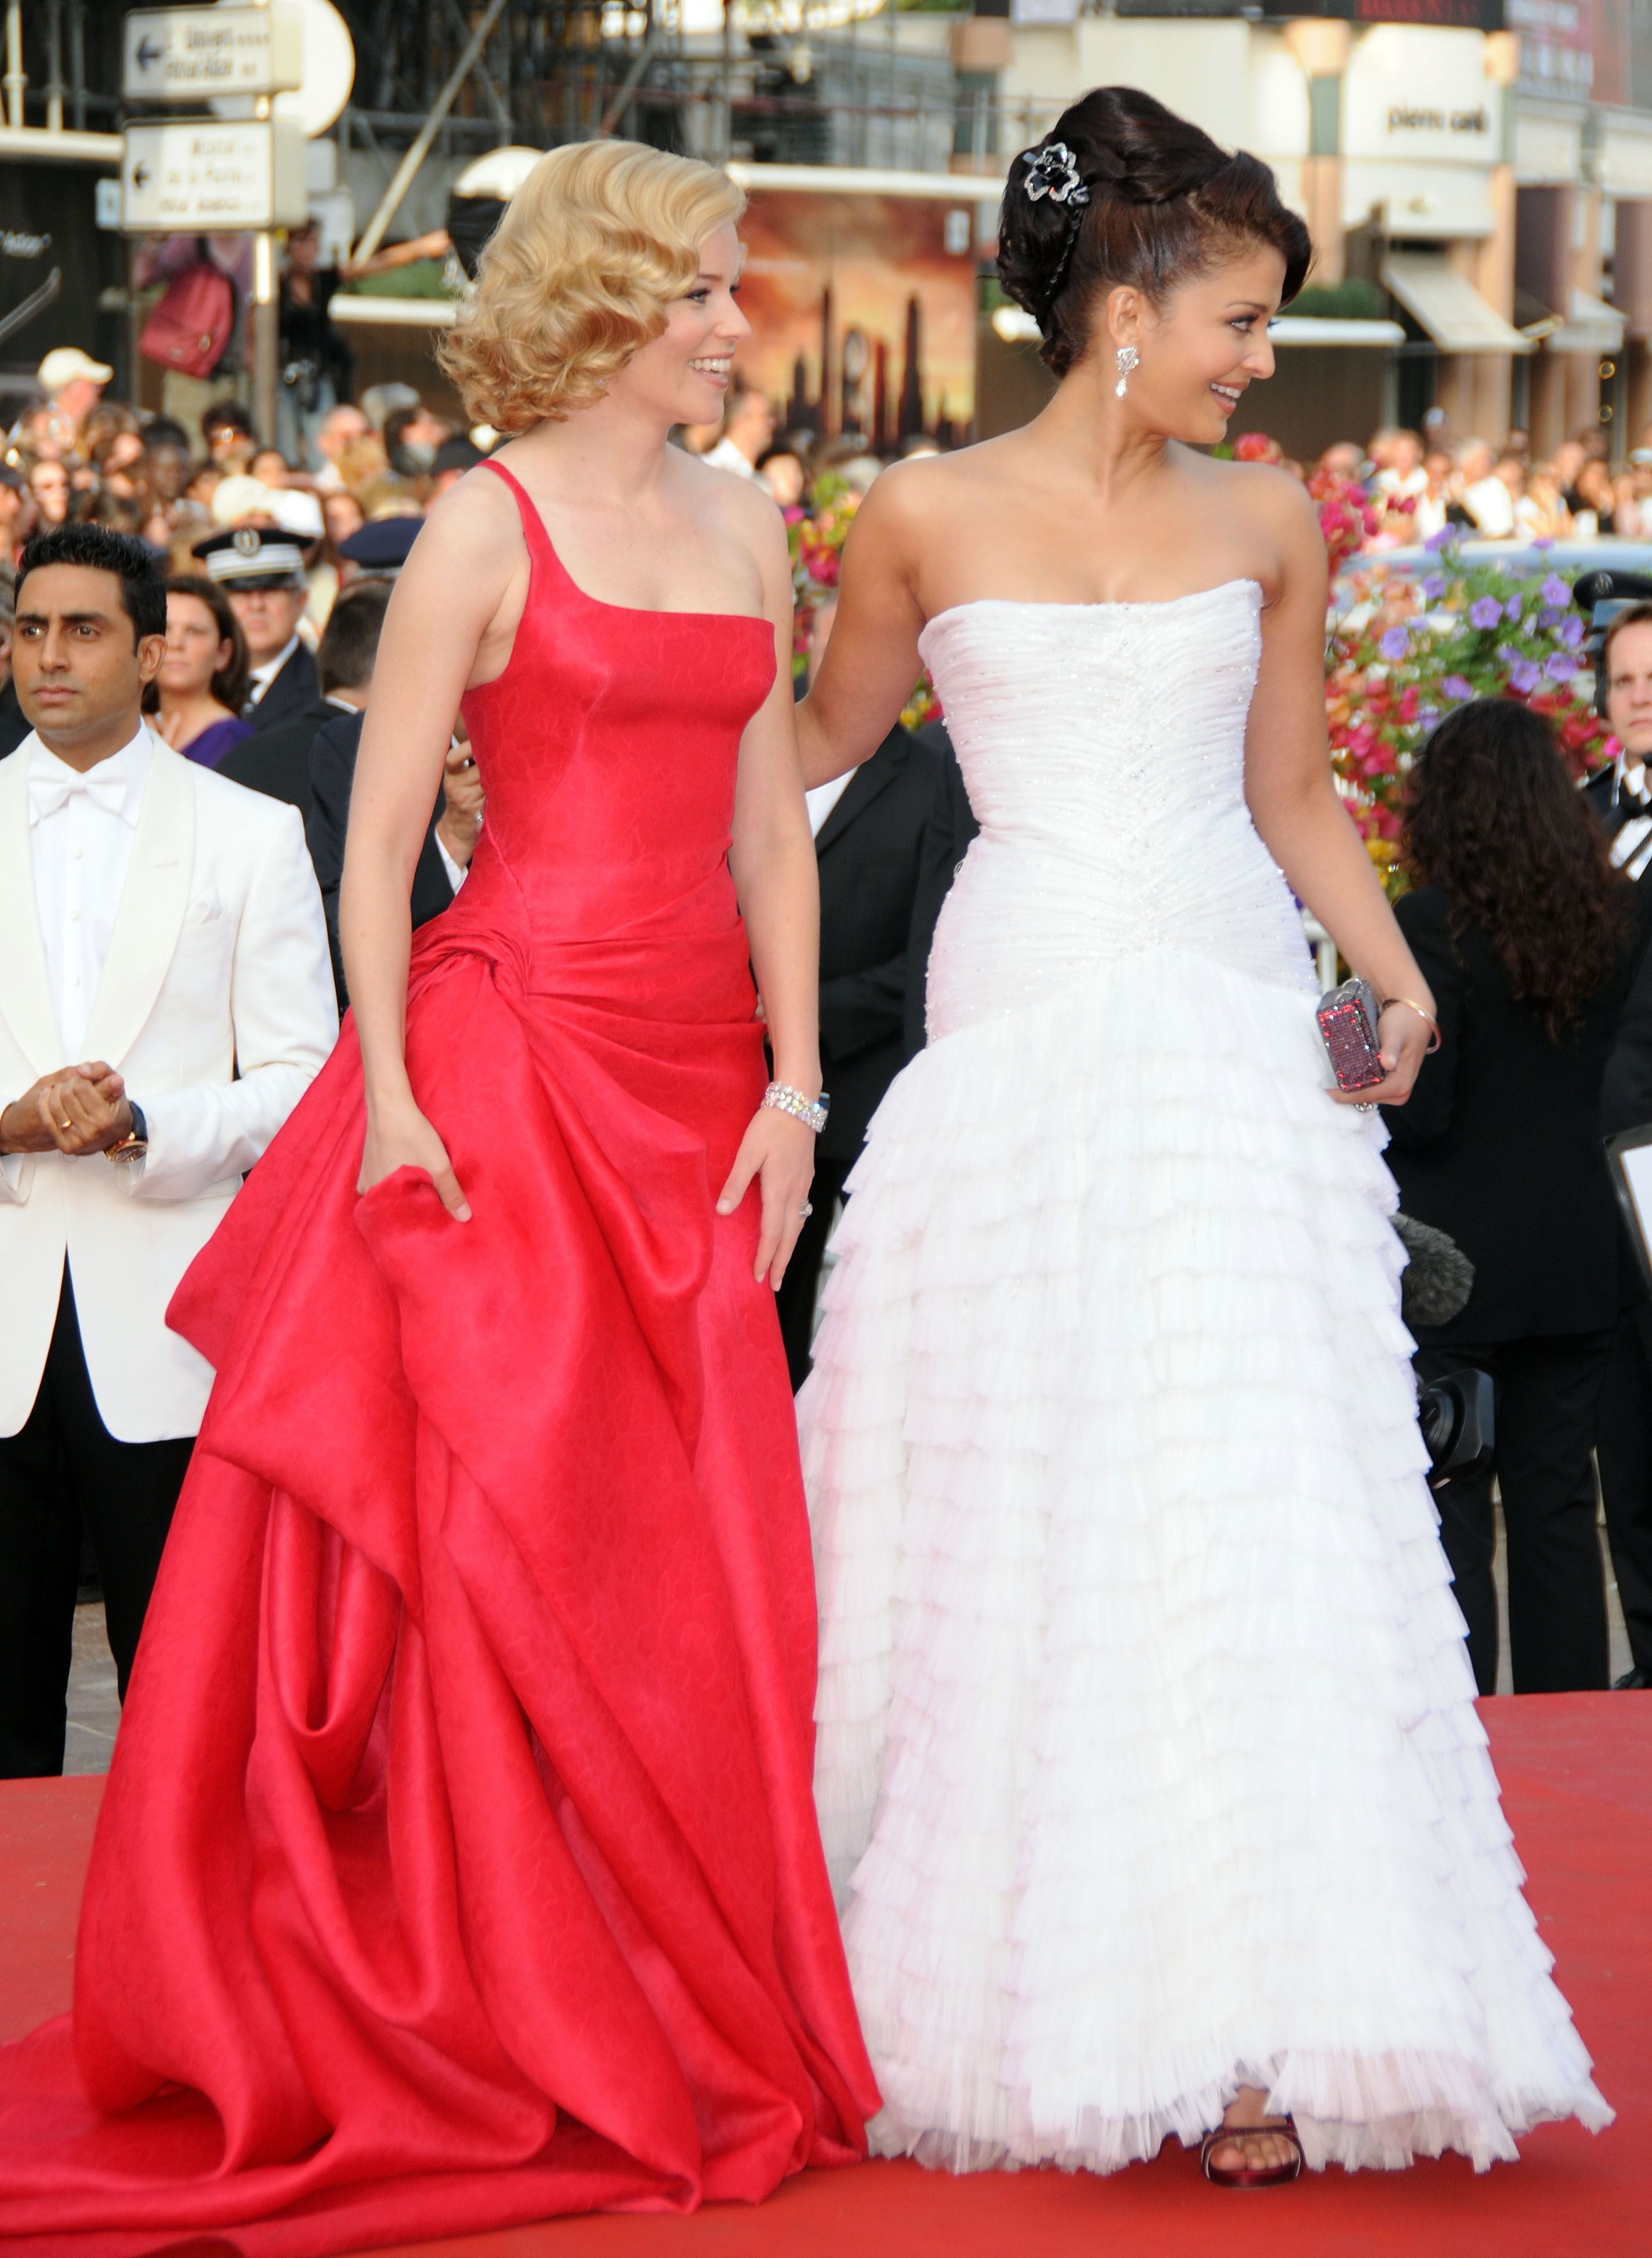 Aishwarya rai wedding dress  Aishwarya Cannes  Premiere Up  AISHWARYA RAI BACHCHAN